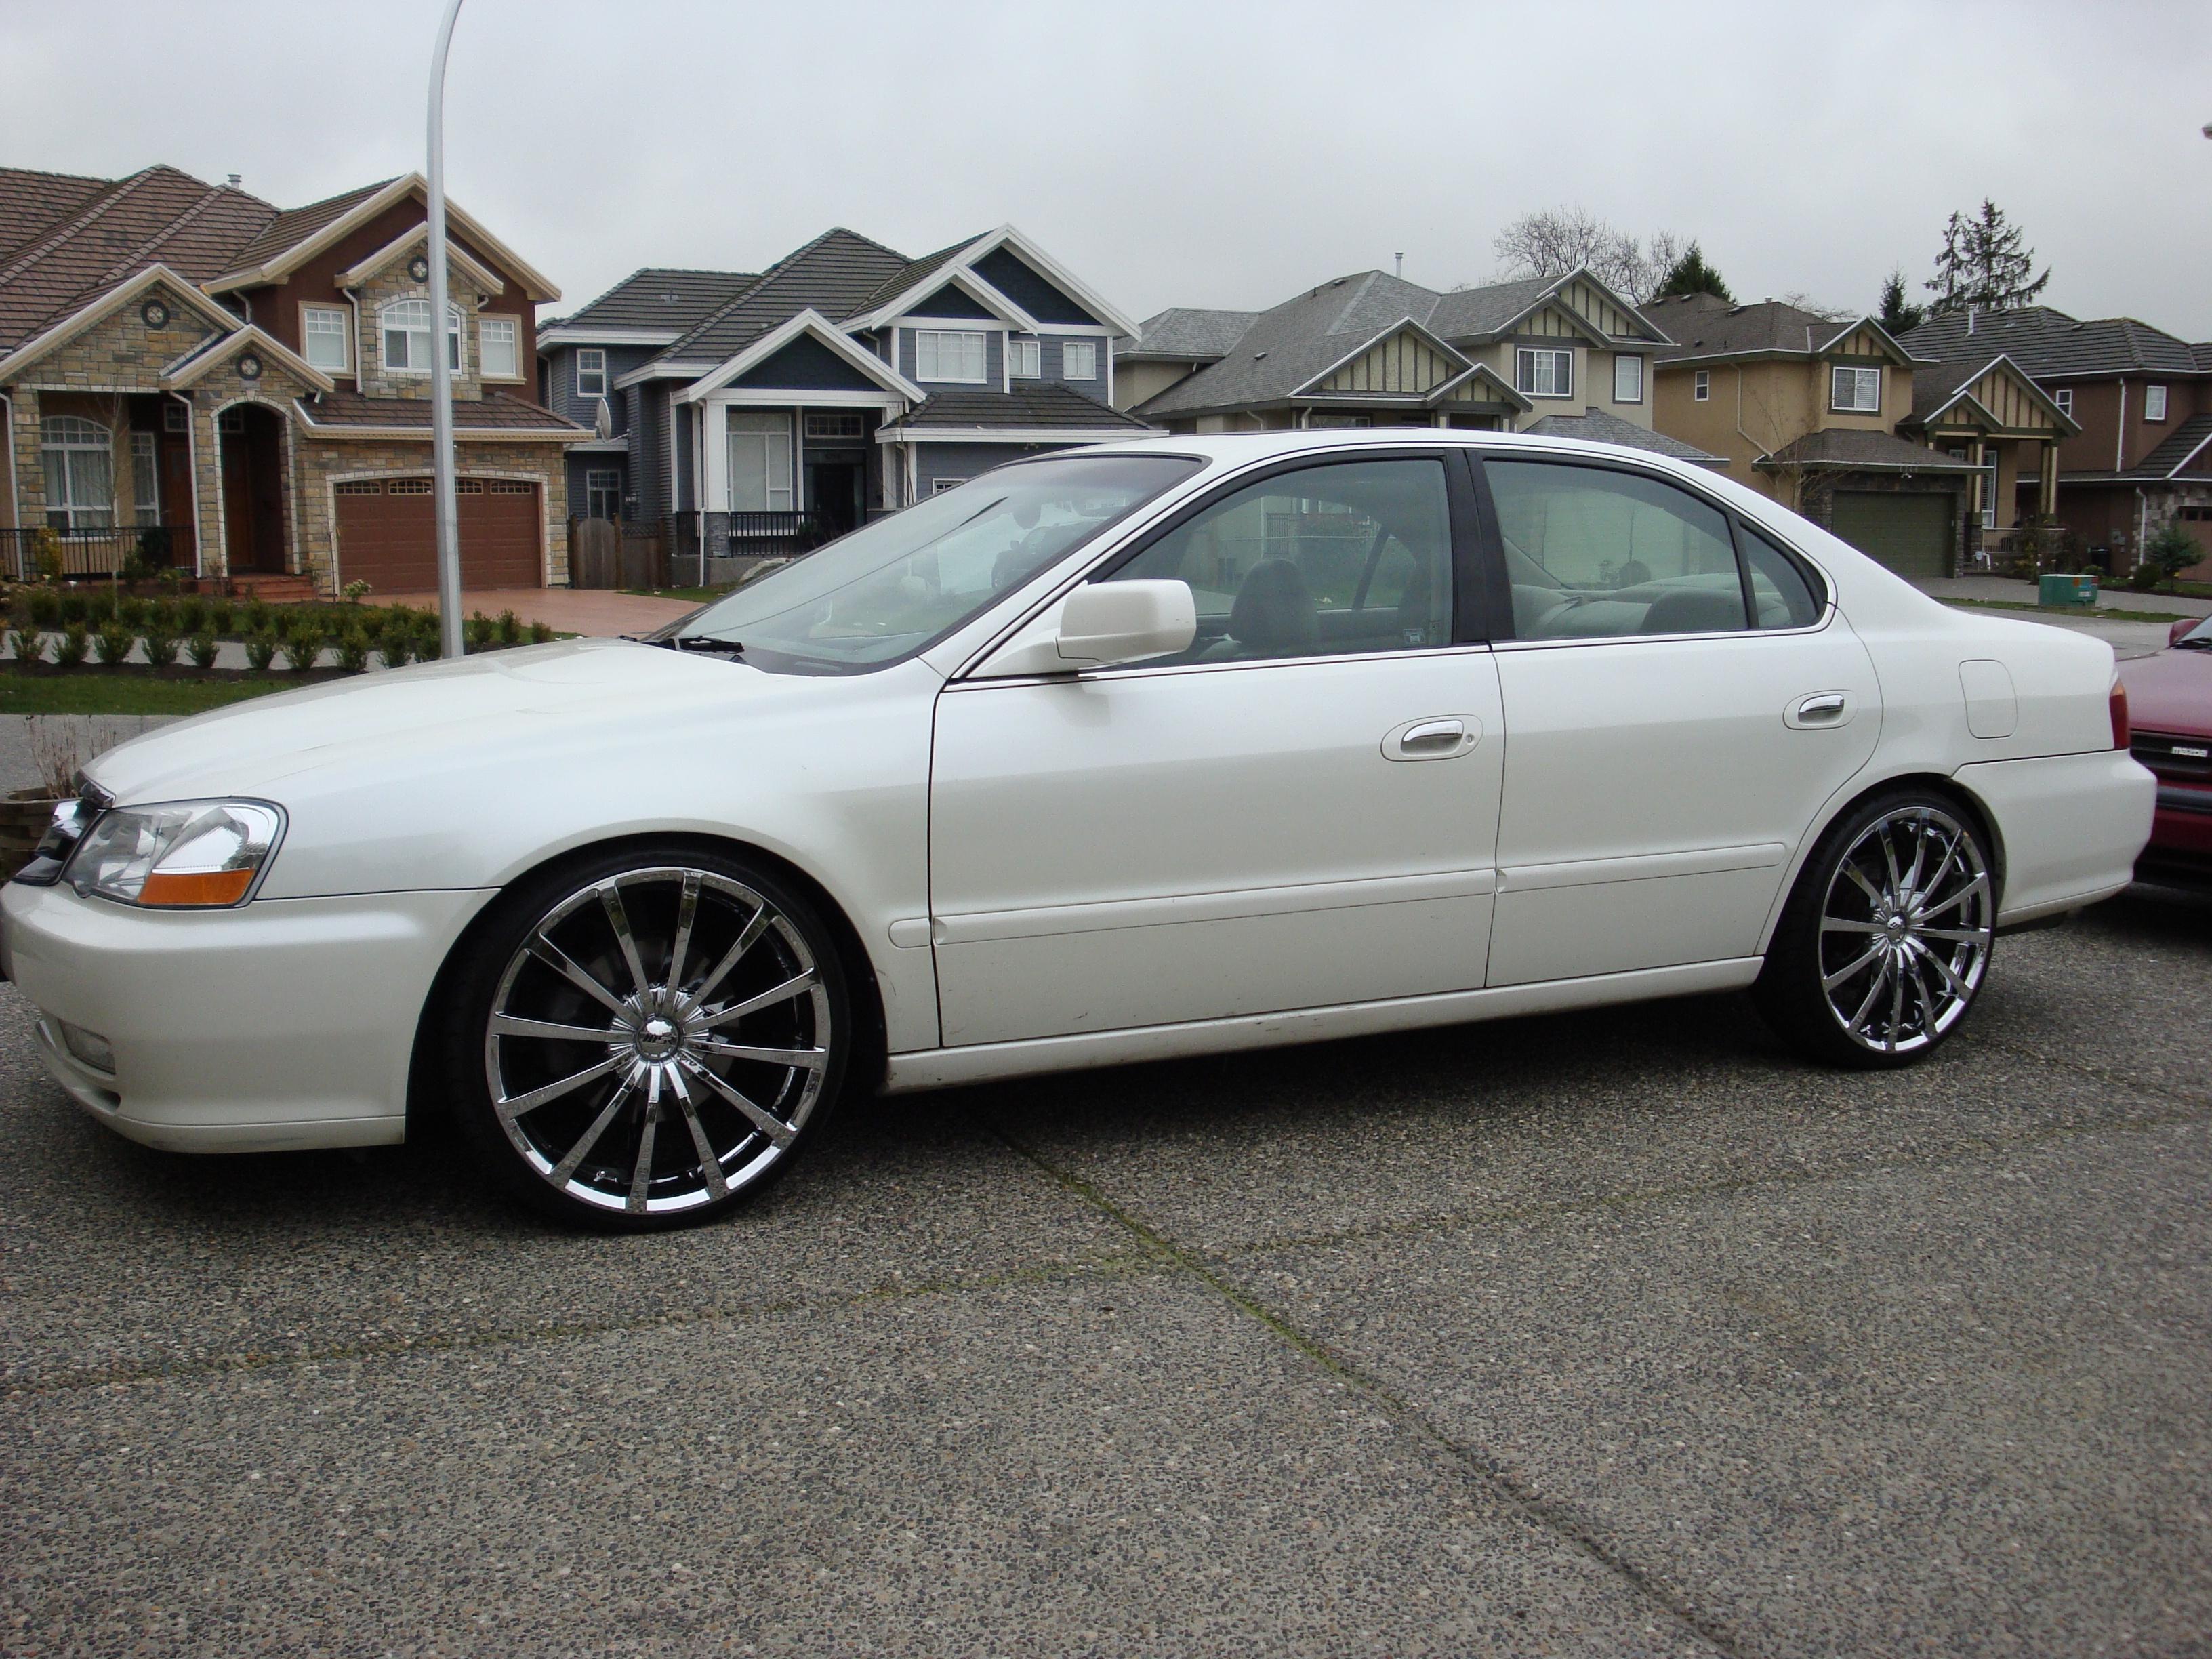 2002 Acura Tl Image 8